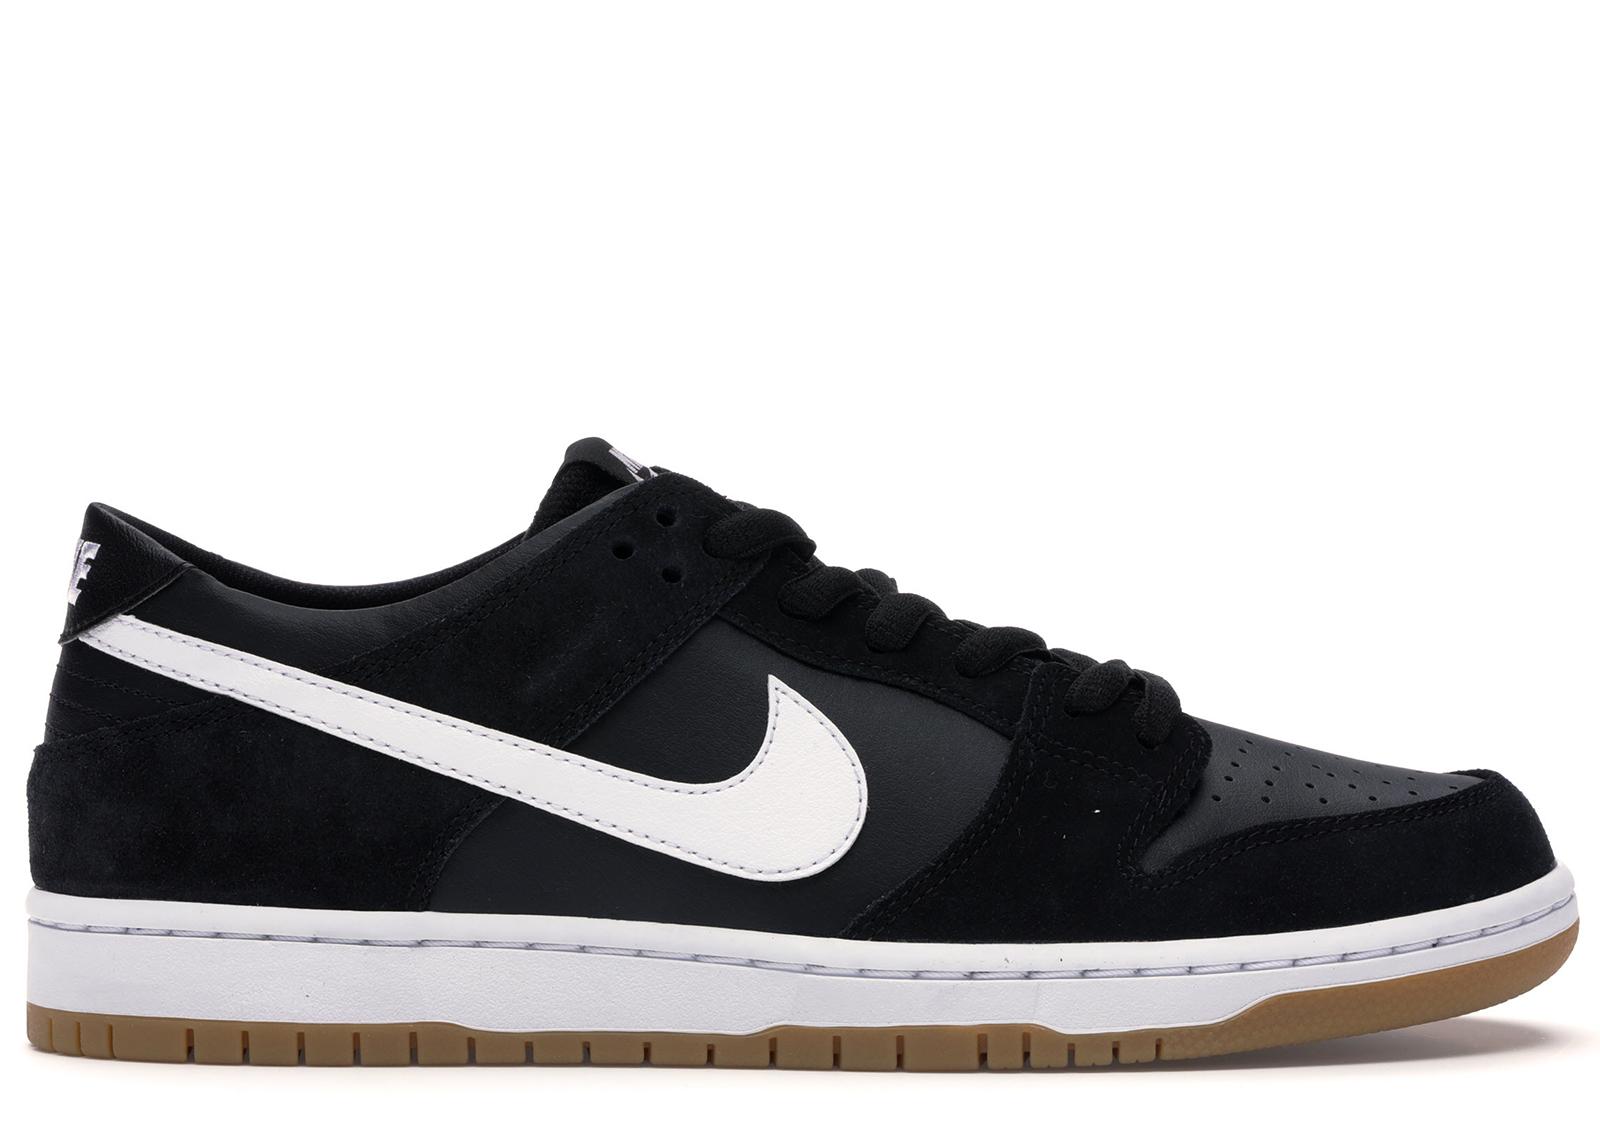 Nike SB Dunk Low Black White Gum